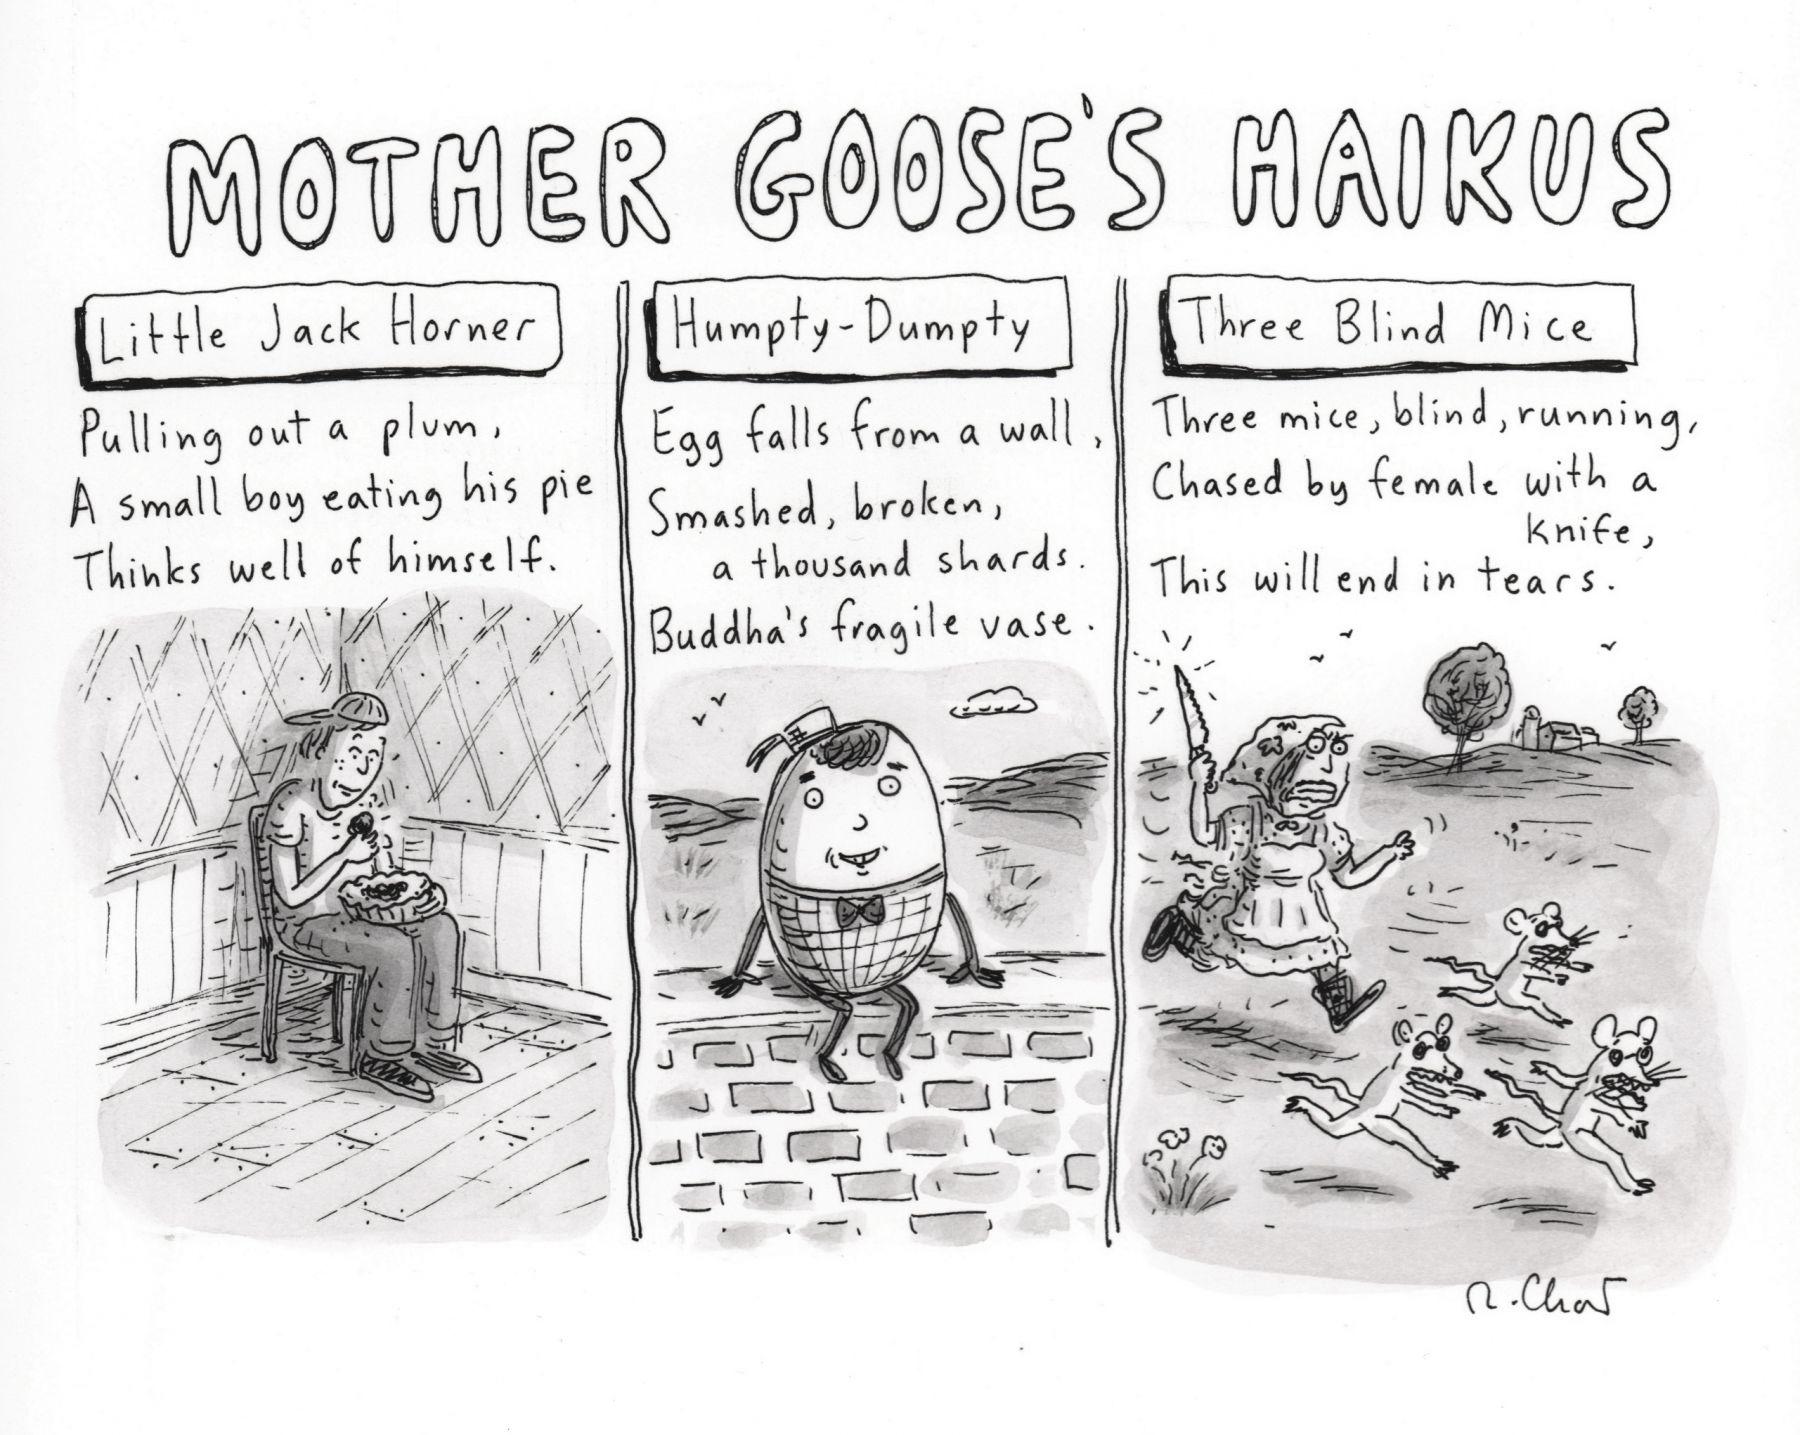 Roz Chast, Mother Goose's Haiku, published November 1, 2010